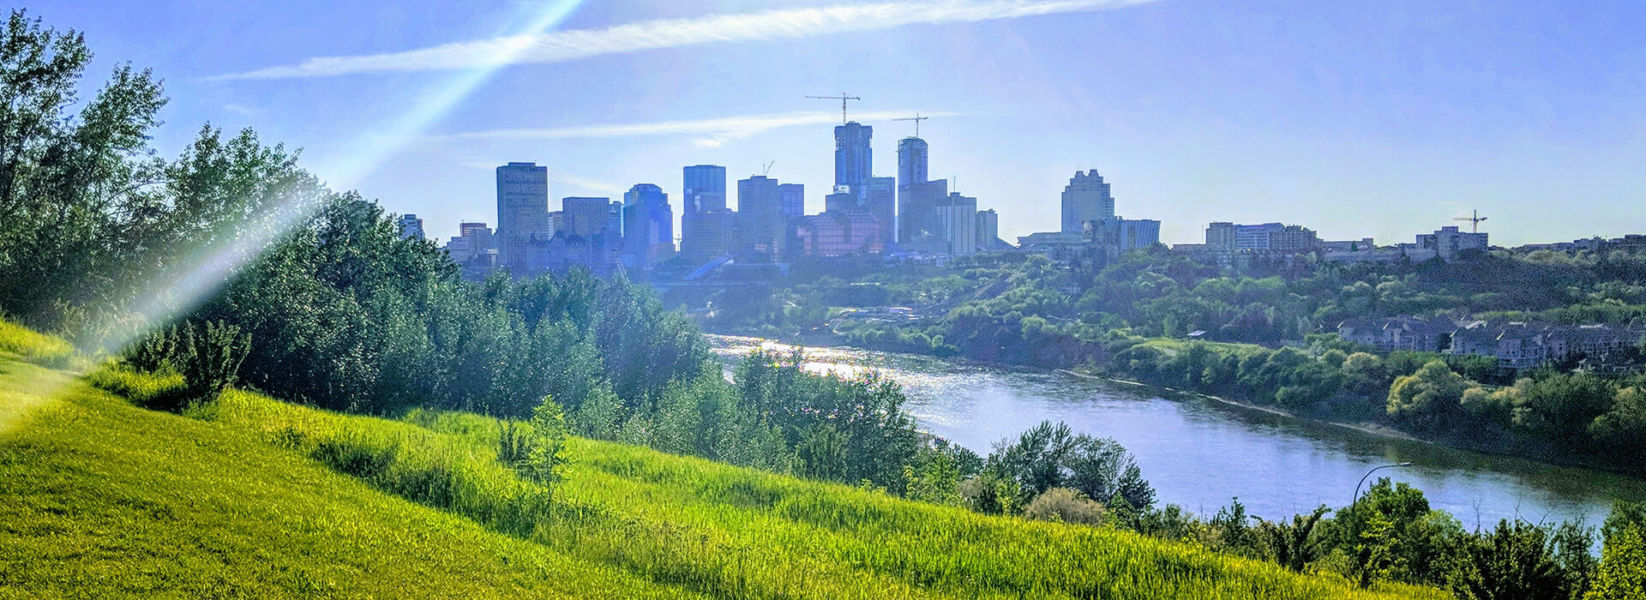 Edmonton Header Image